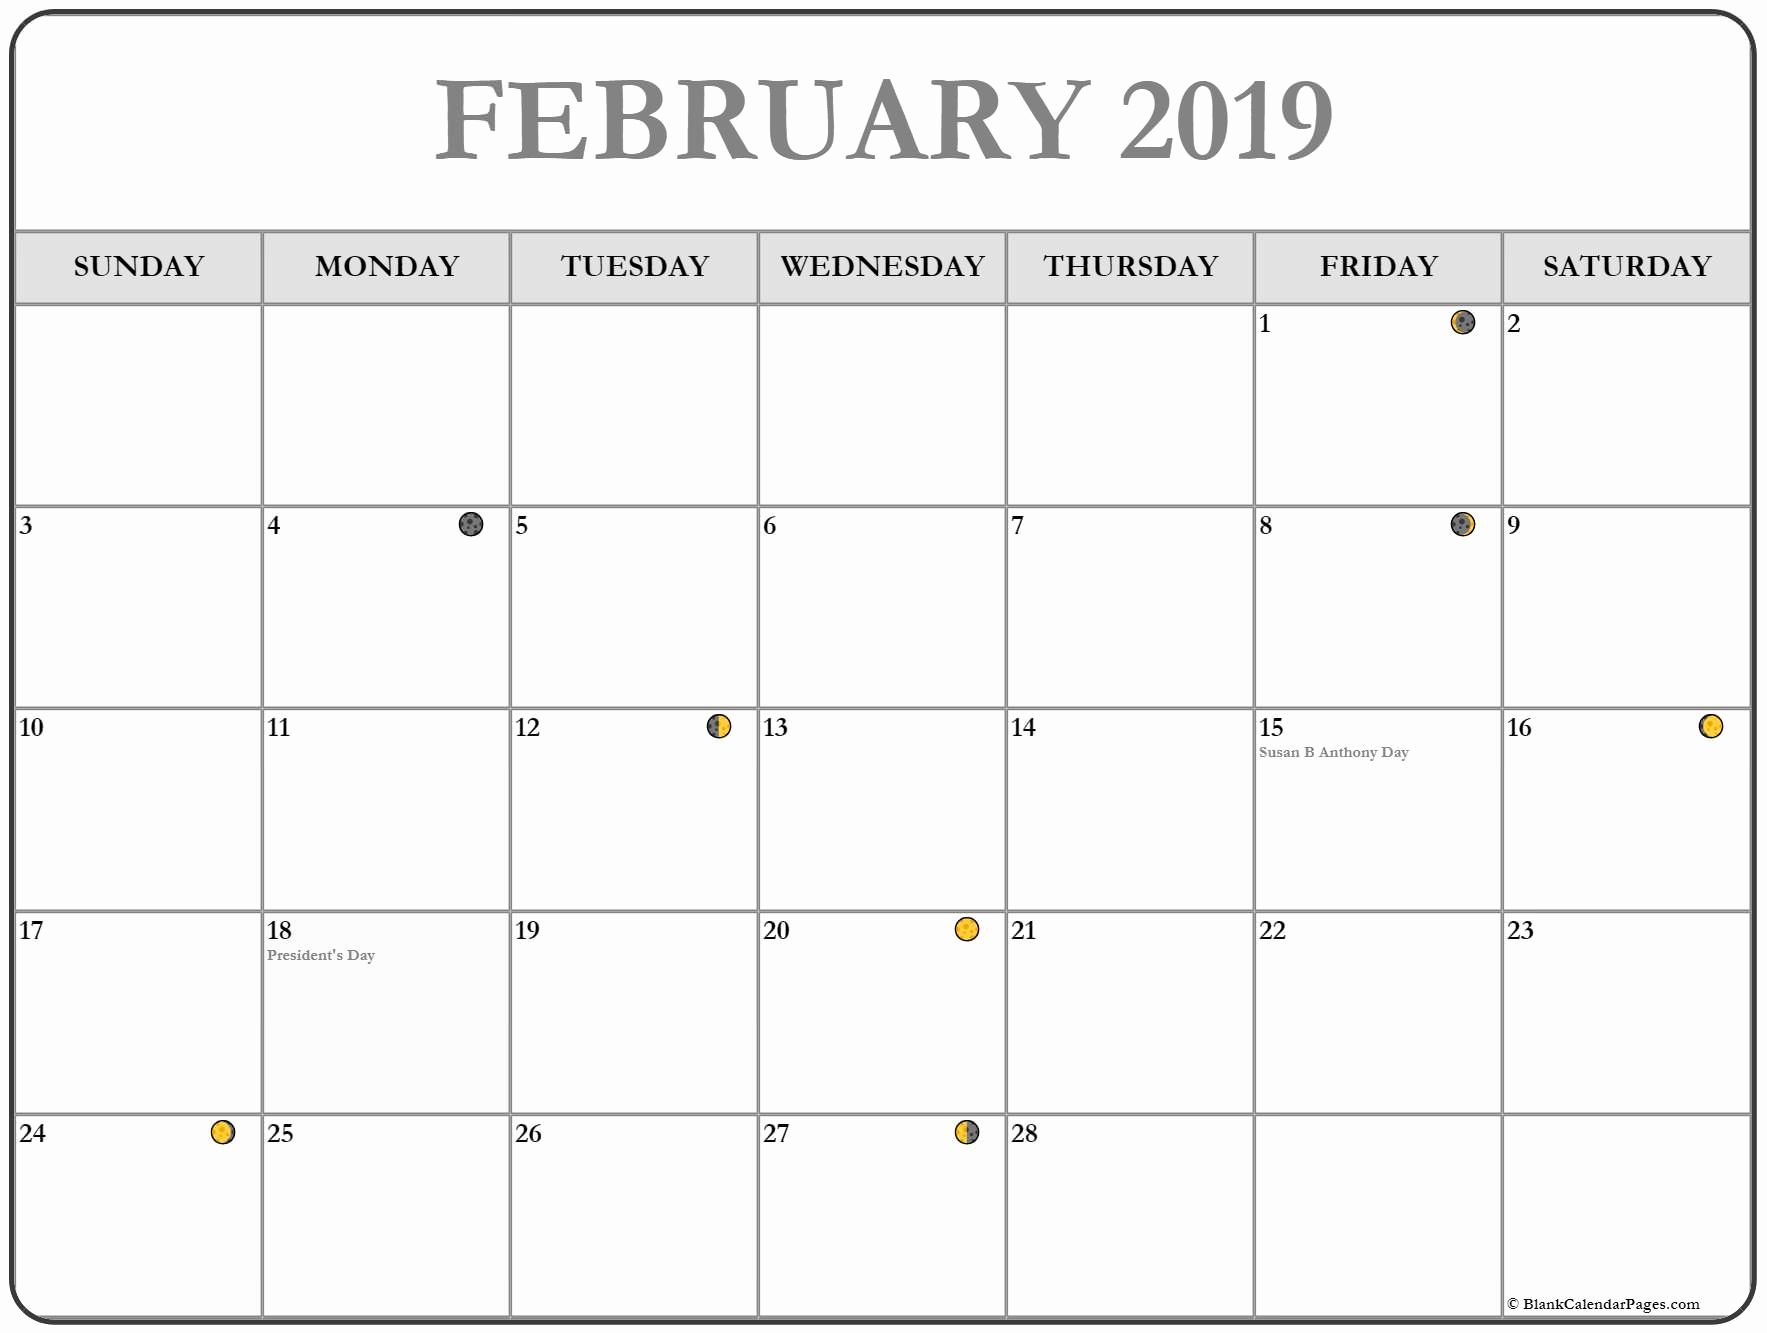 Lunar Calendar February 2019 August Calendar Calendar Printables 2019 Calendar